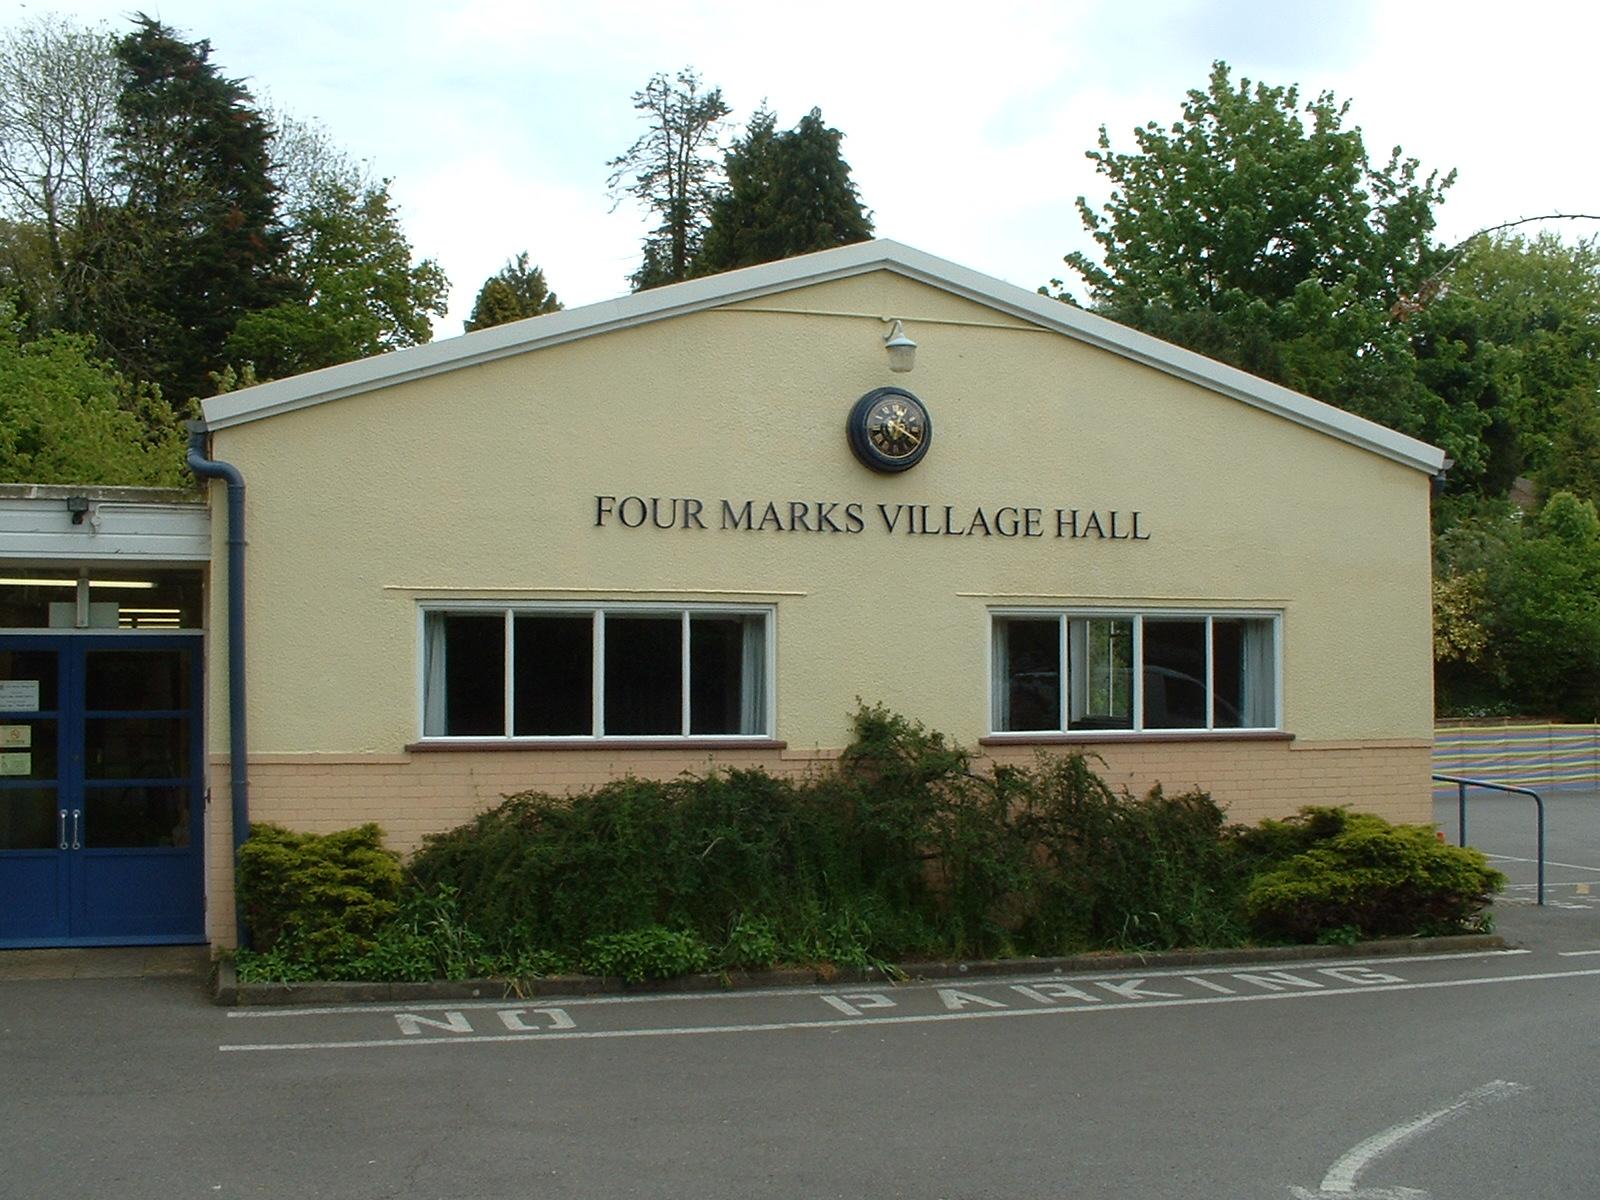 Village hall clock